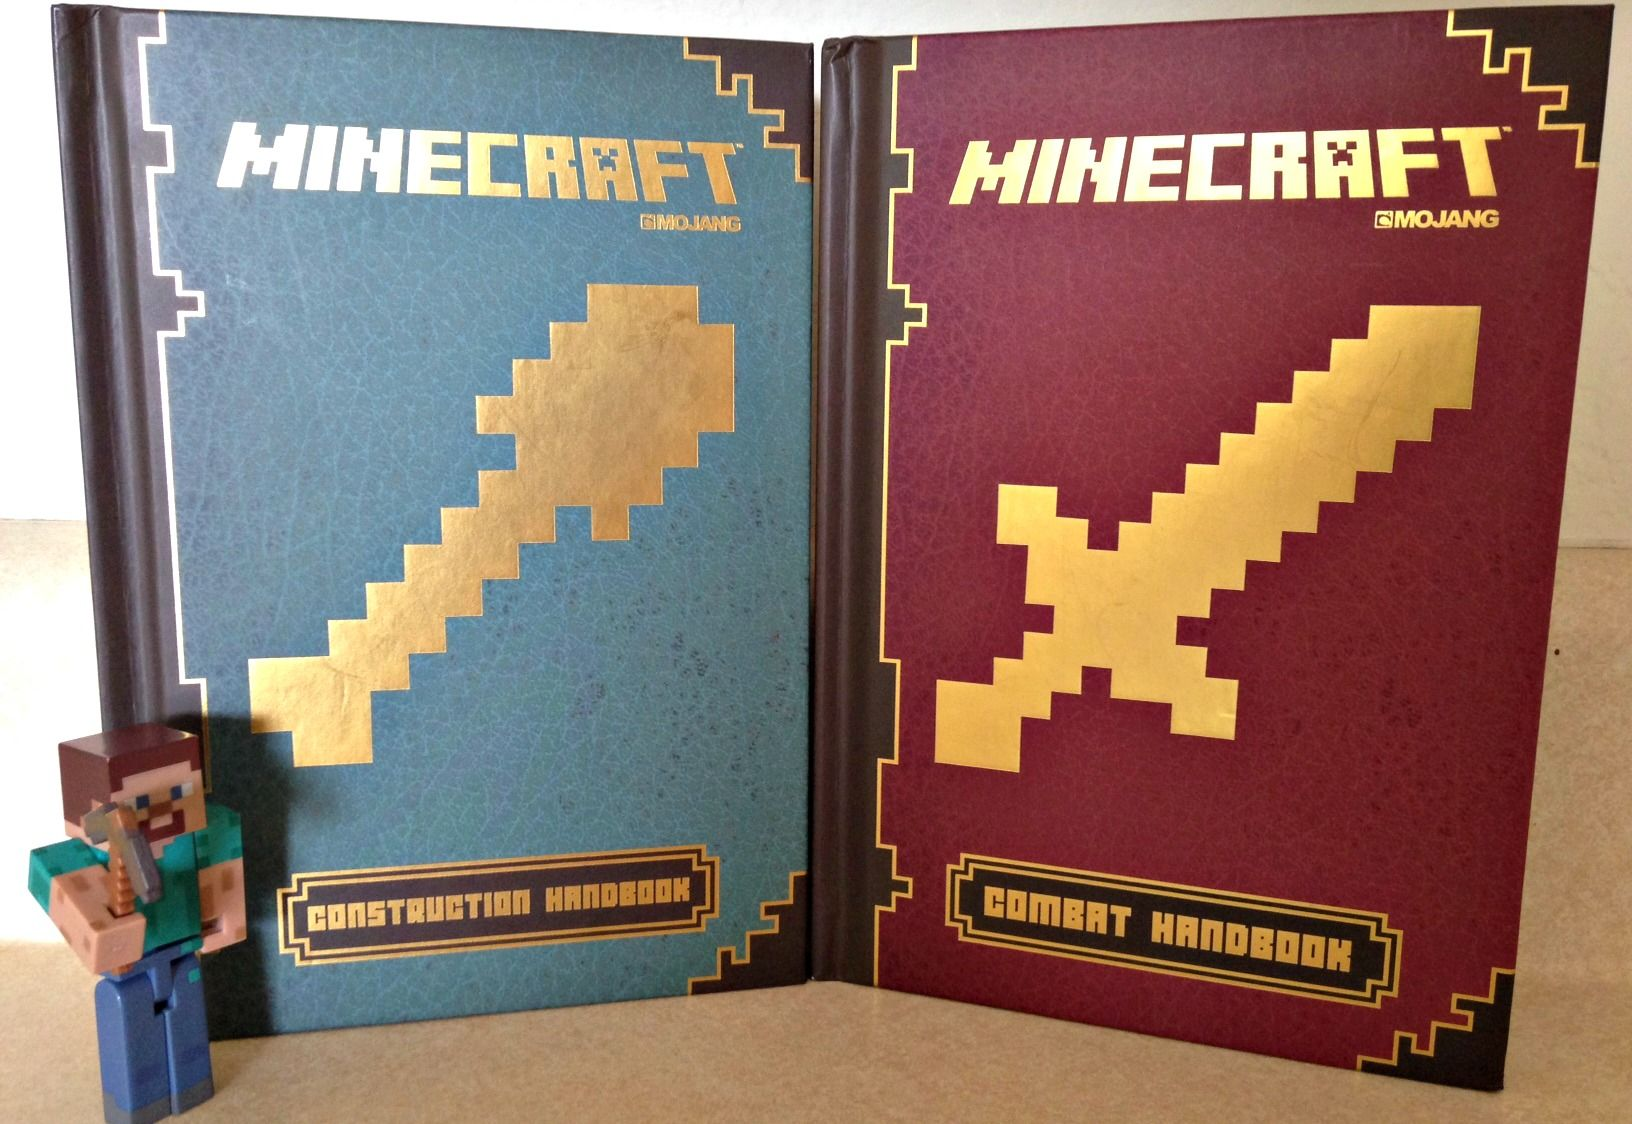 Minecraft Combat Handbook & Minecraft Construction Handbook